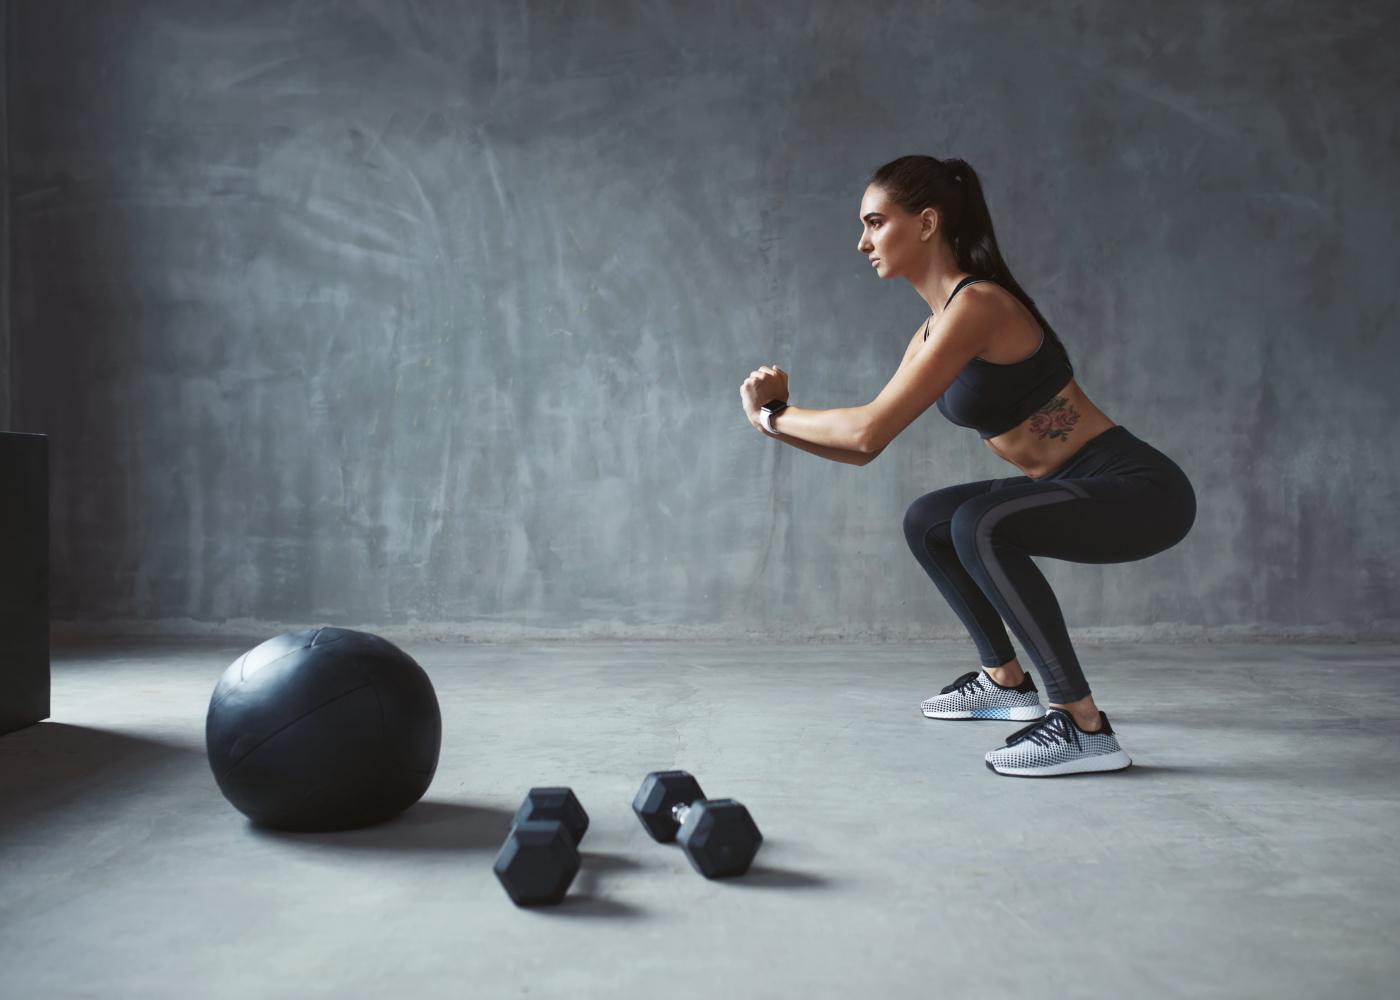 exercicios de crossfit para emagrecer agachamentos